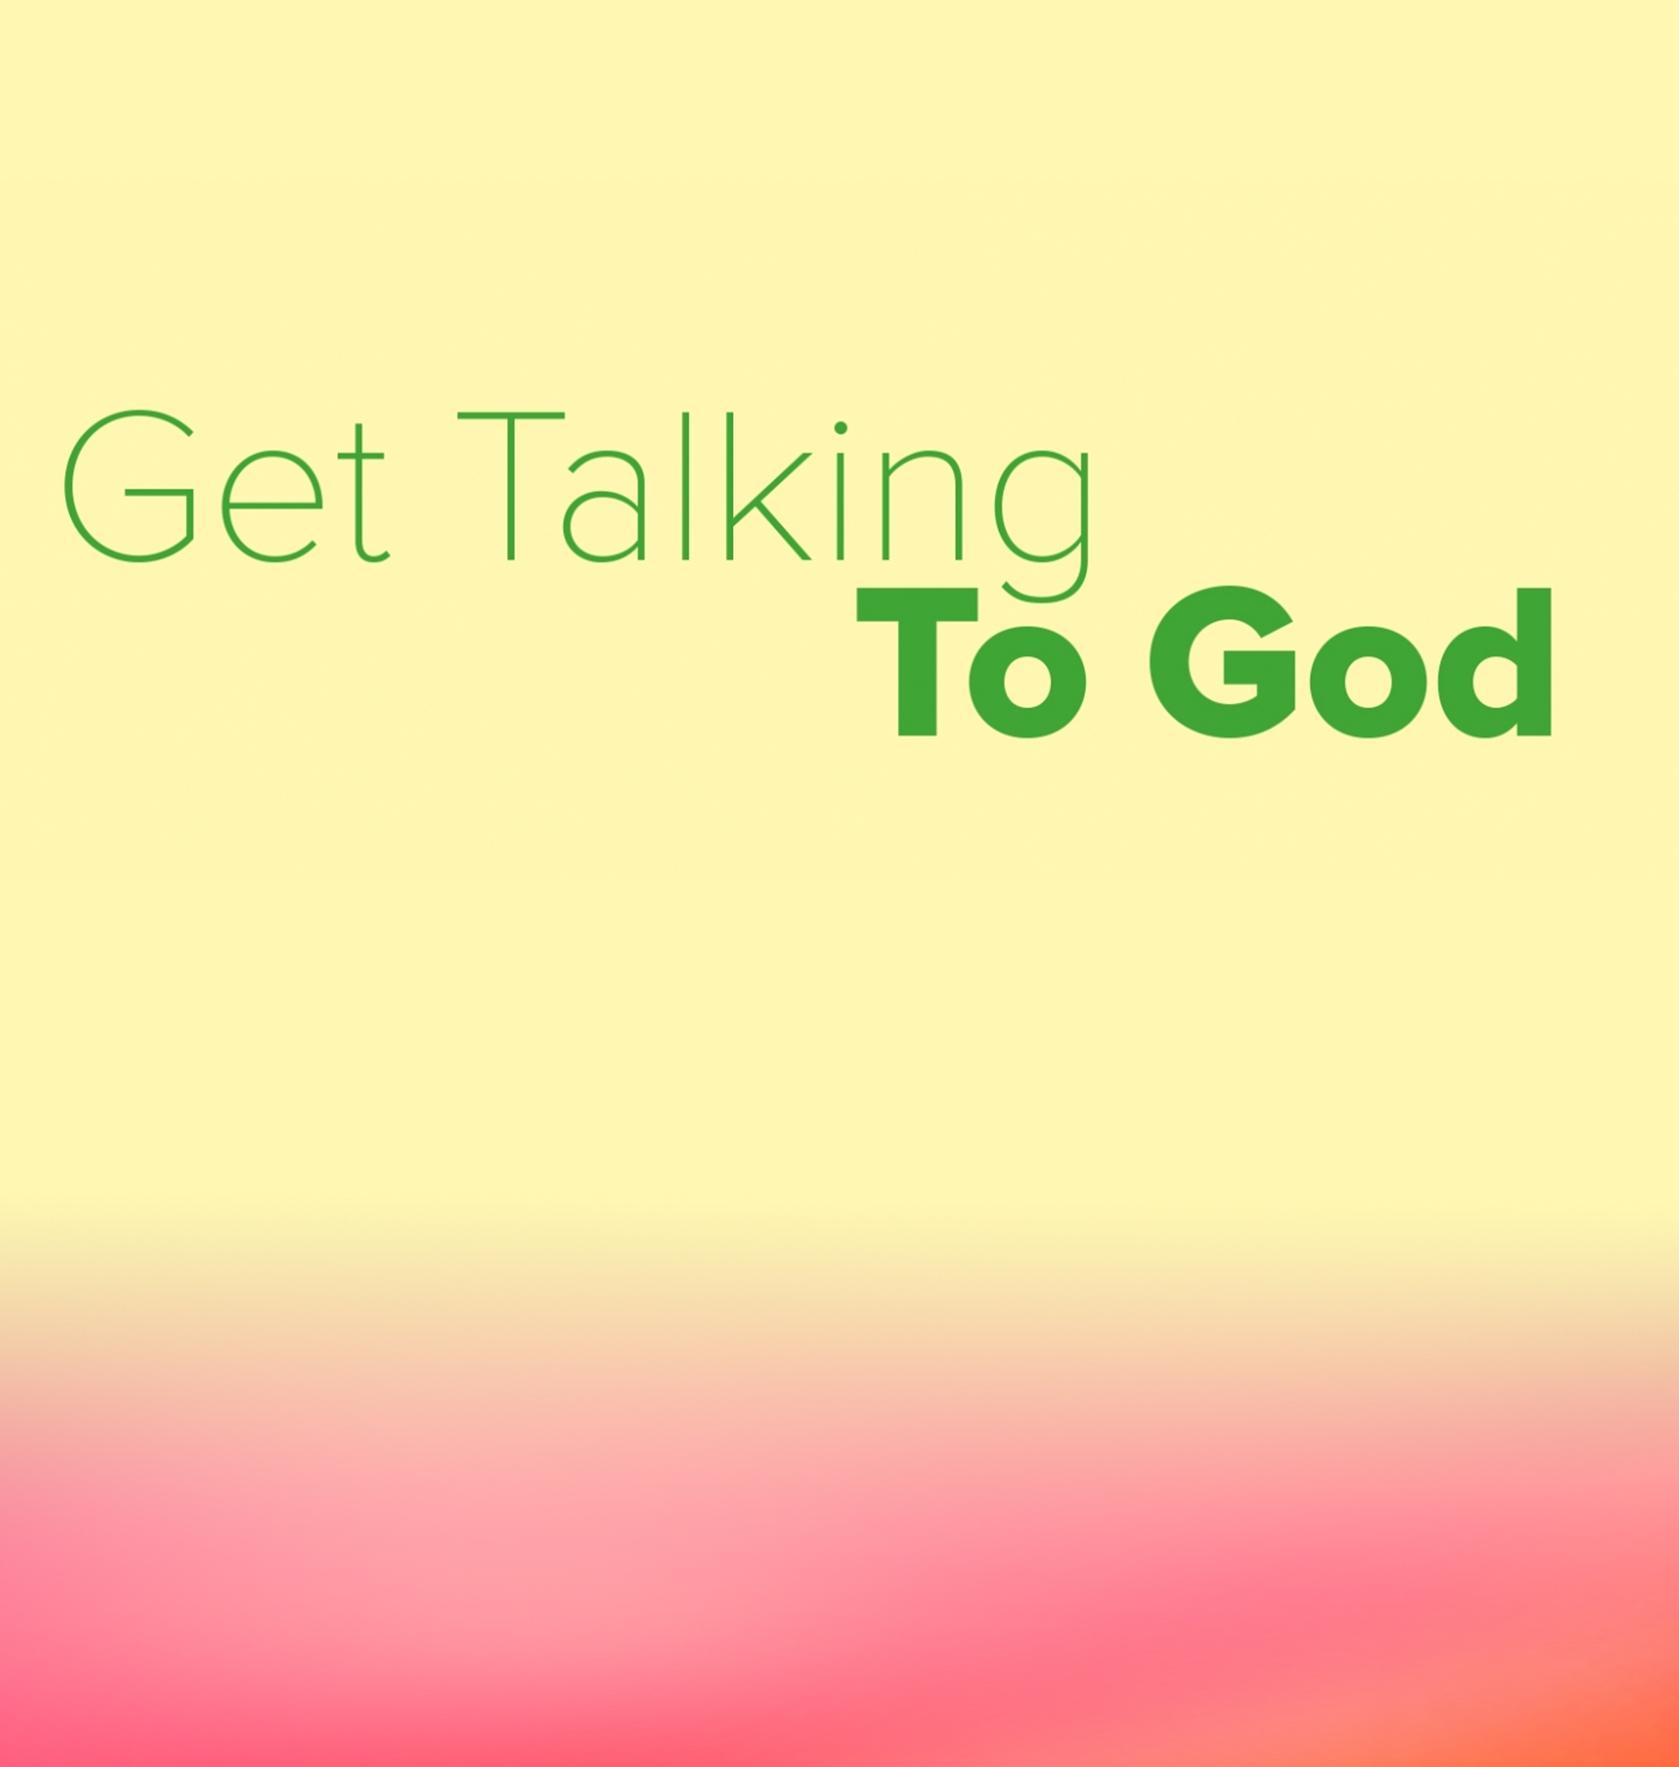 Get talking to God